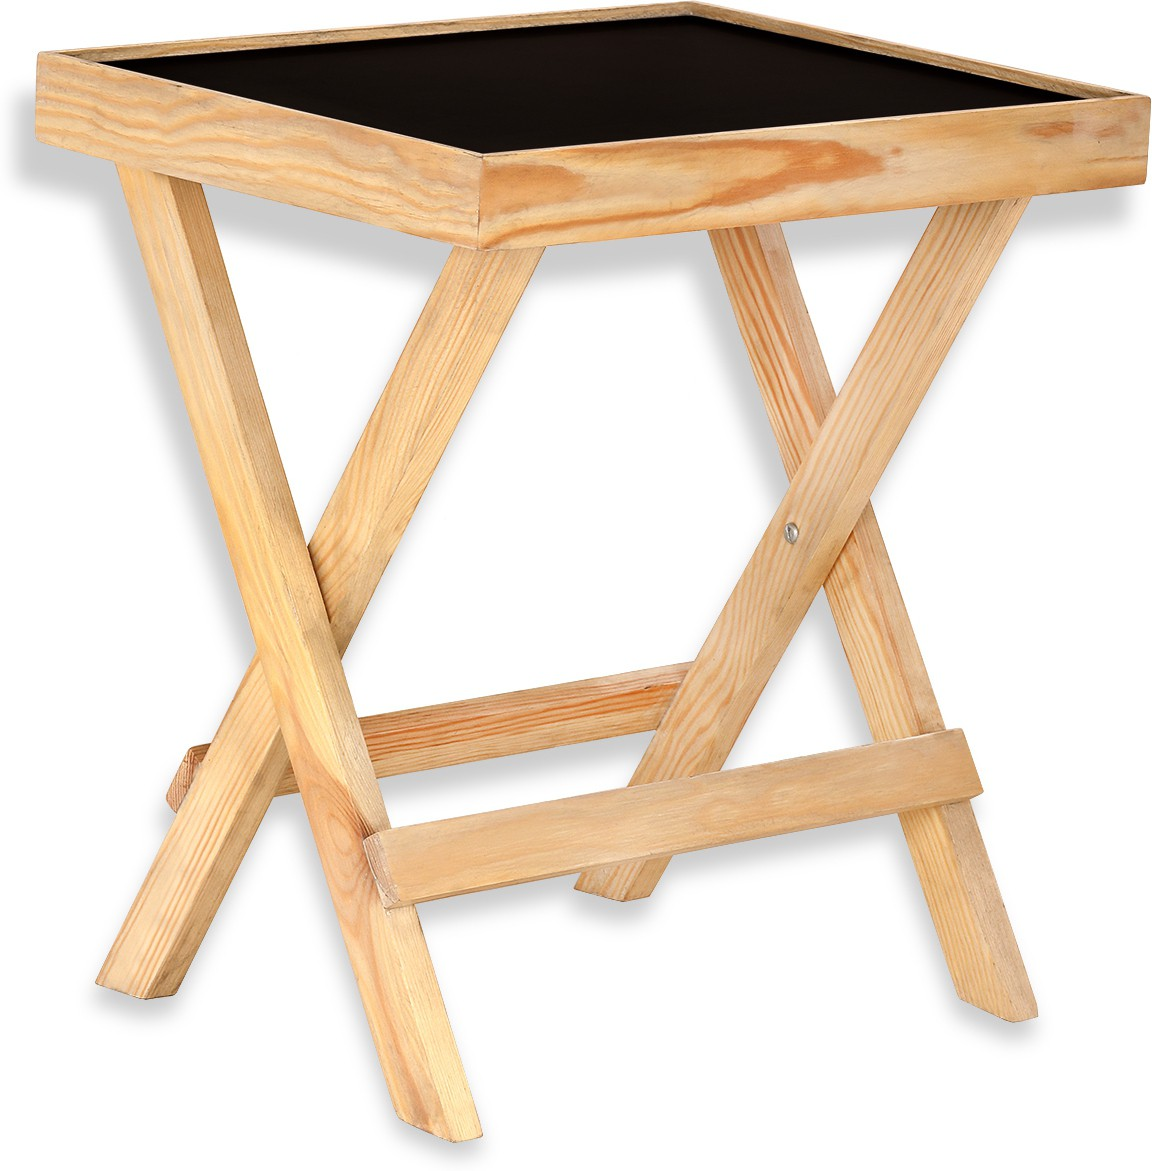 View NETWOOD DESIGNER Solid Wood Side Table(Finish Color - Natural Matte Finish) Furniture (Netwood Designer)